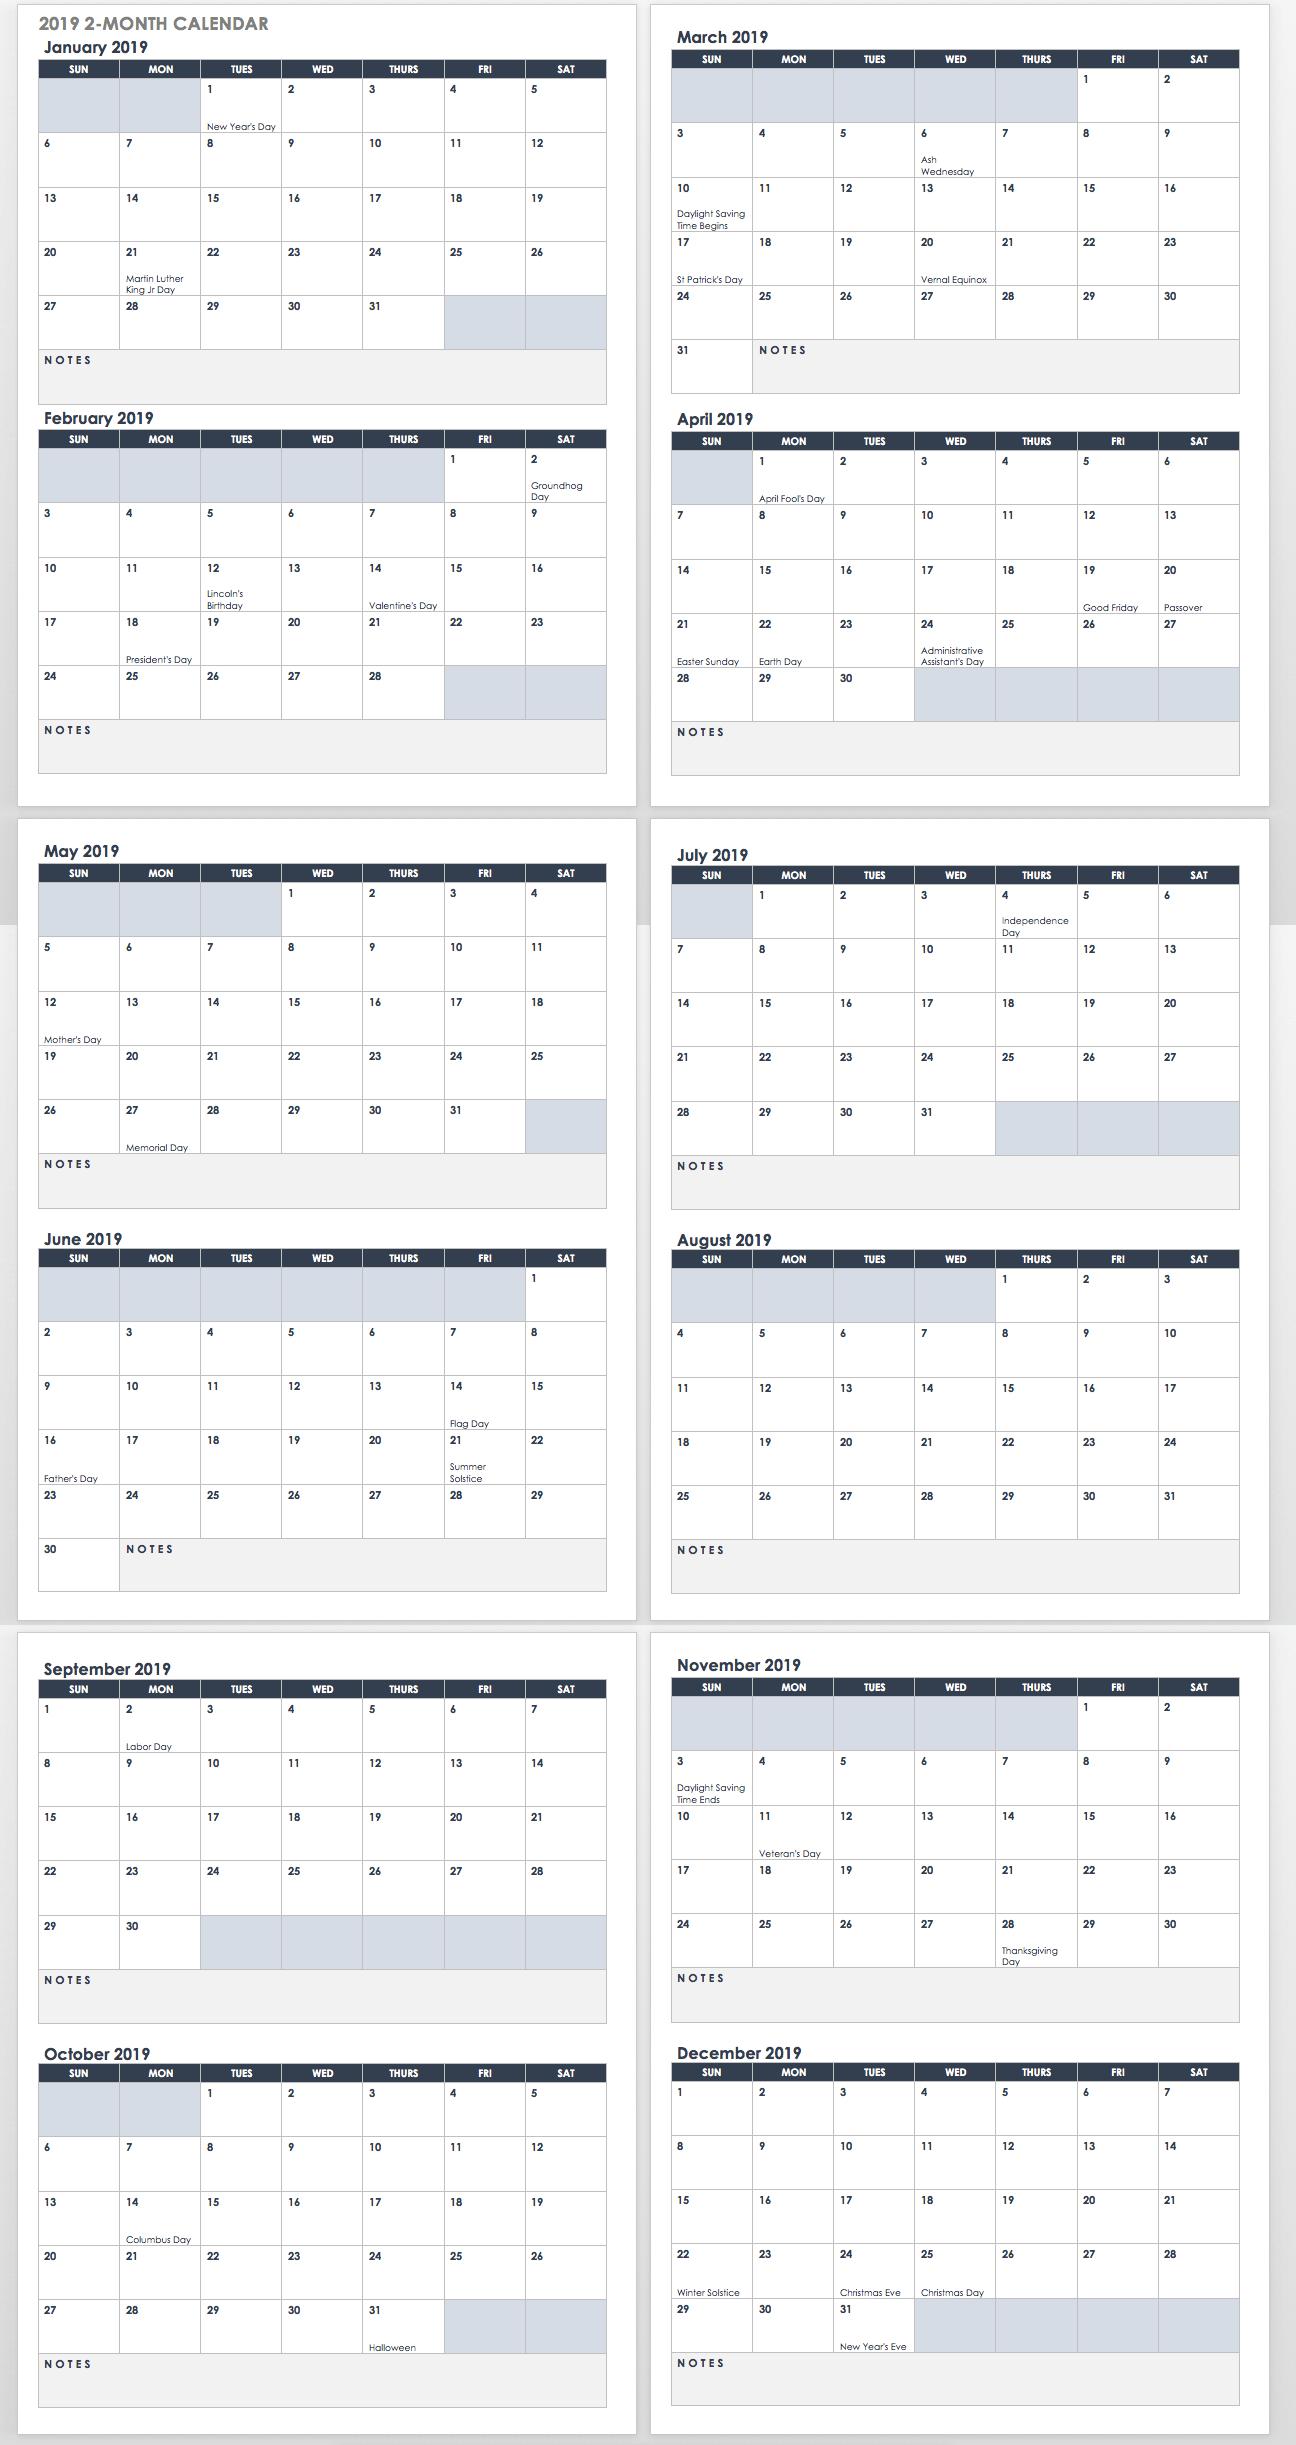 15 Free Monthly Calendar Templates | Smartsheet throughout Monthly Calendar Printable Template Notes Column